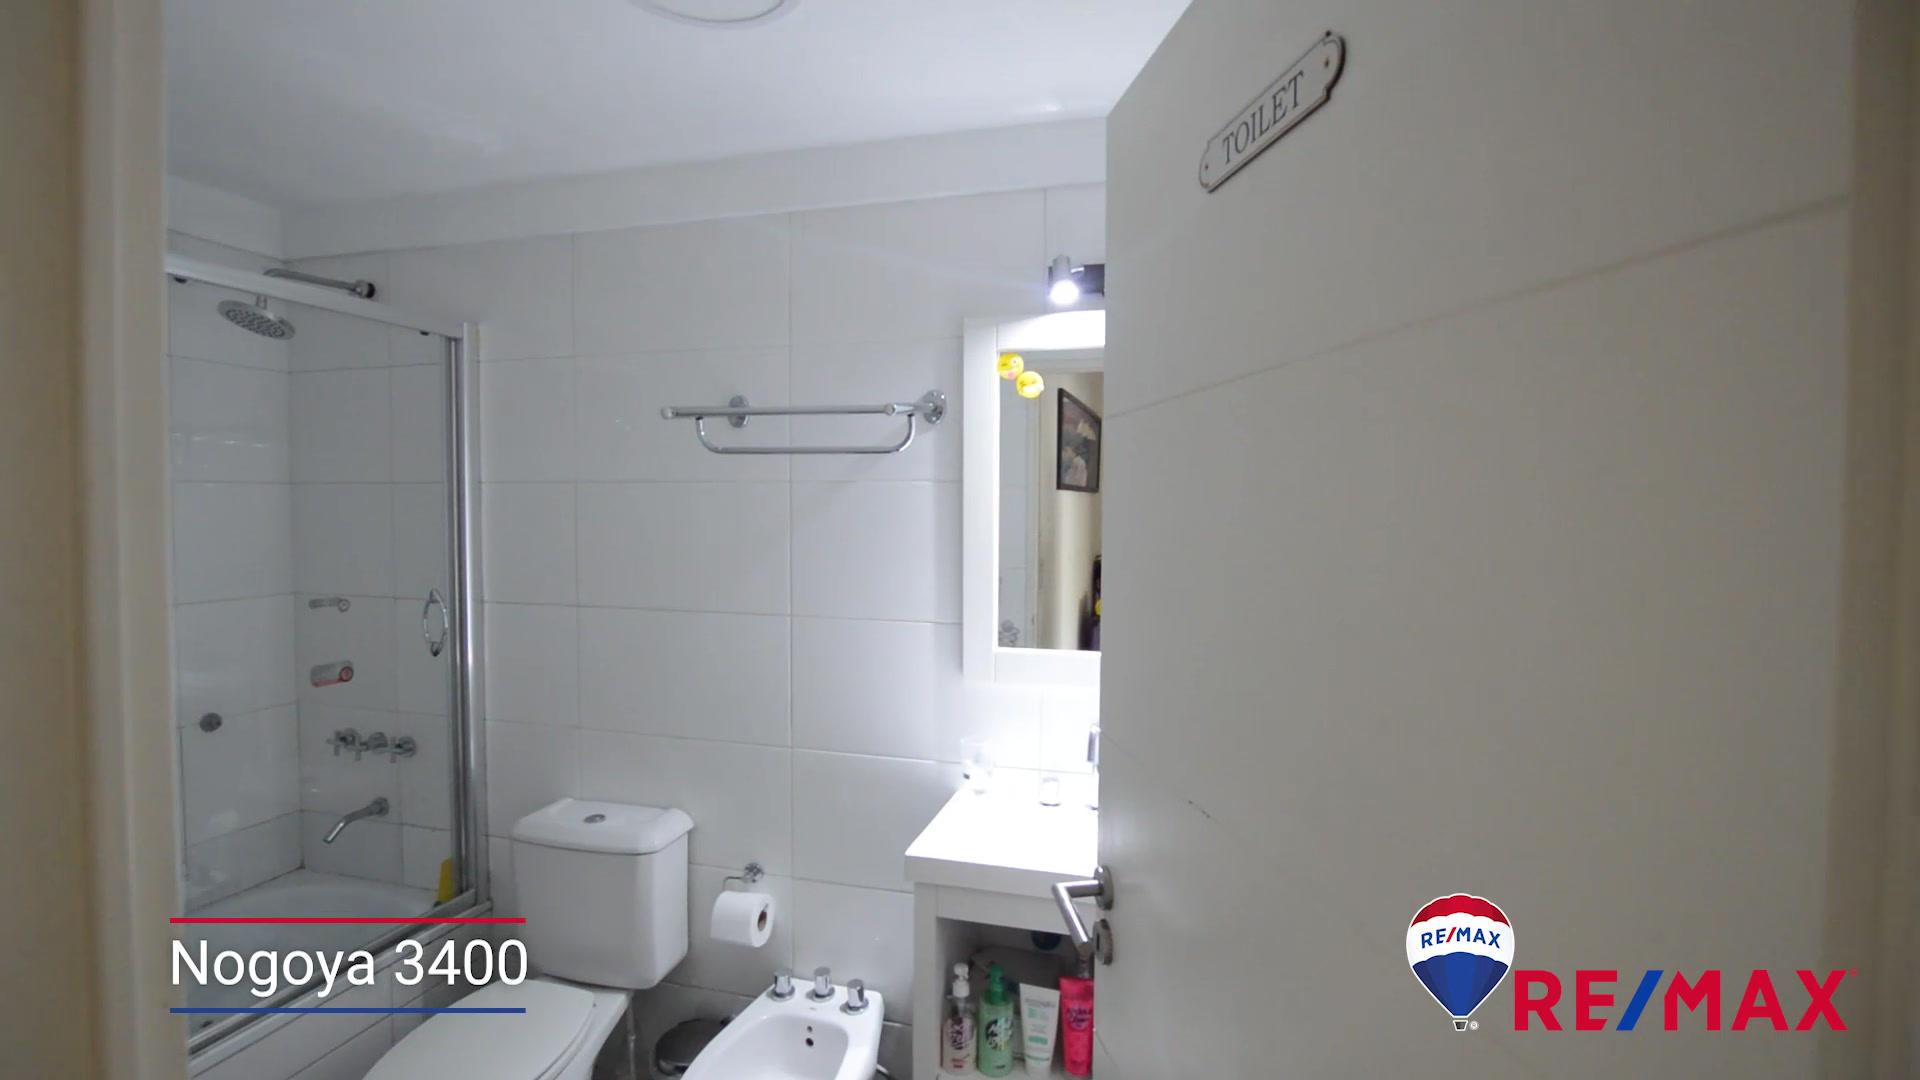 S-N - Nogoya 3400 - REM.mp4